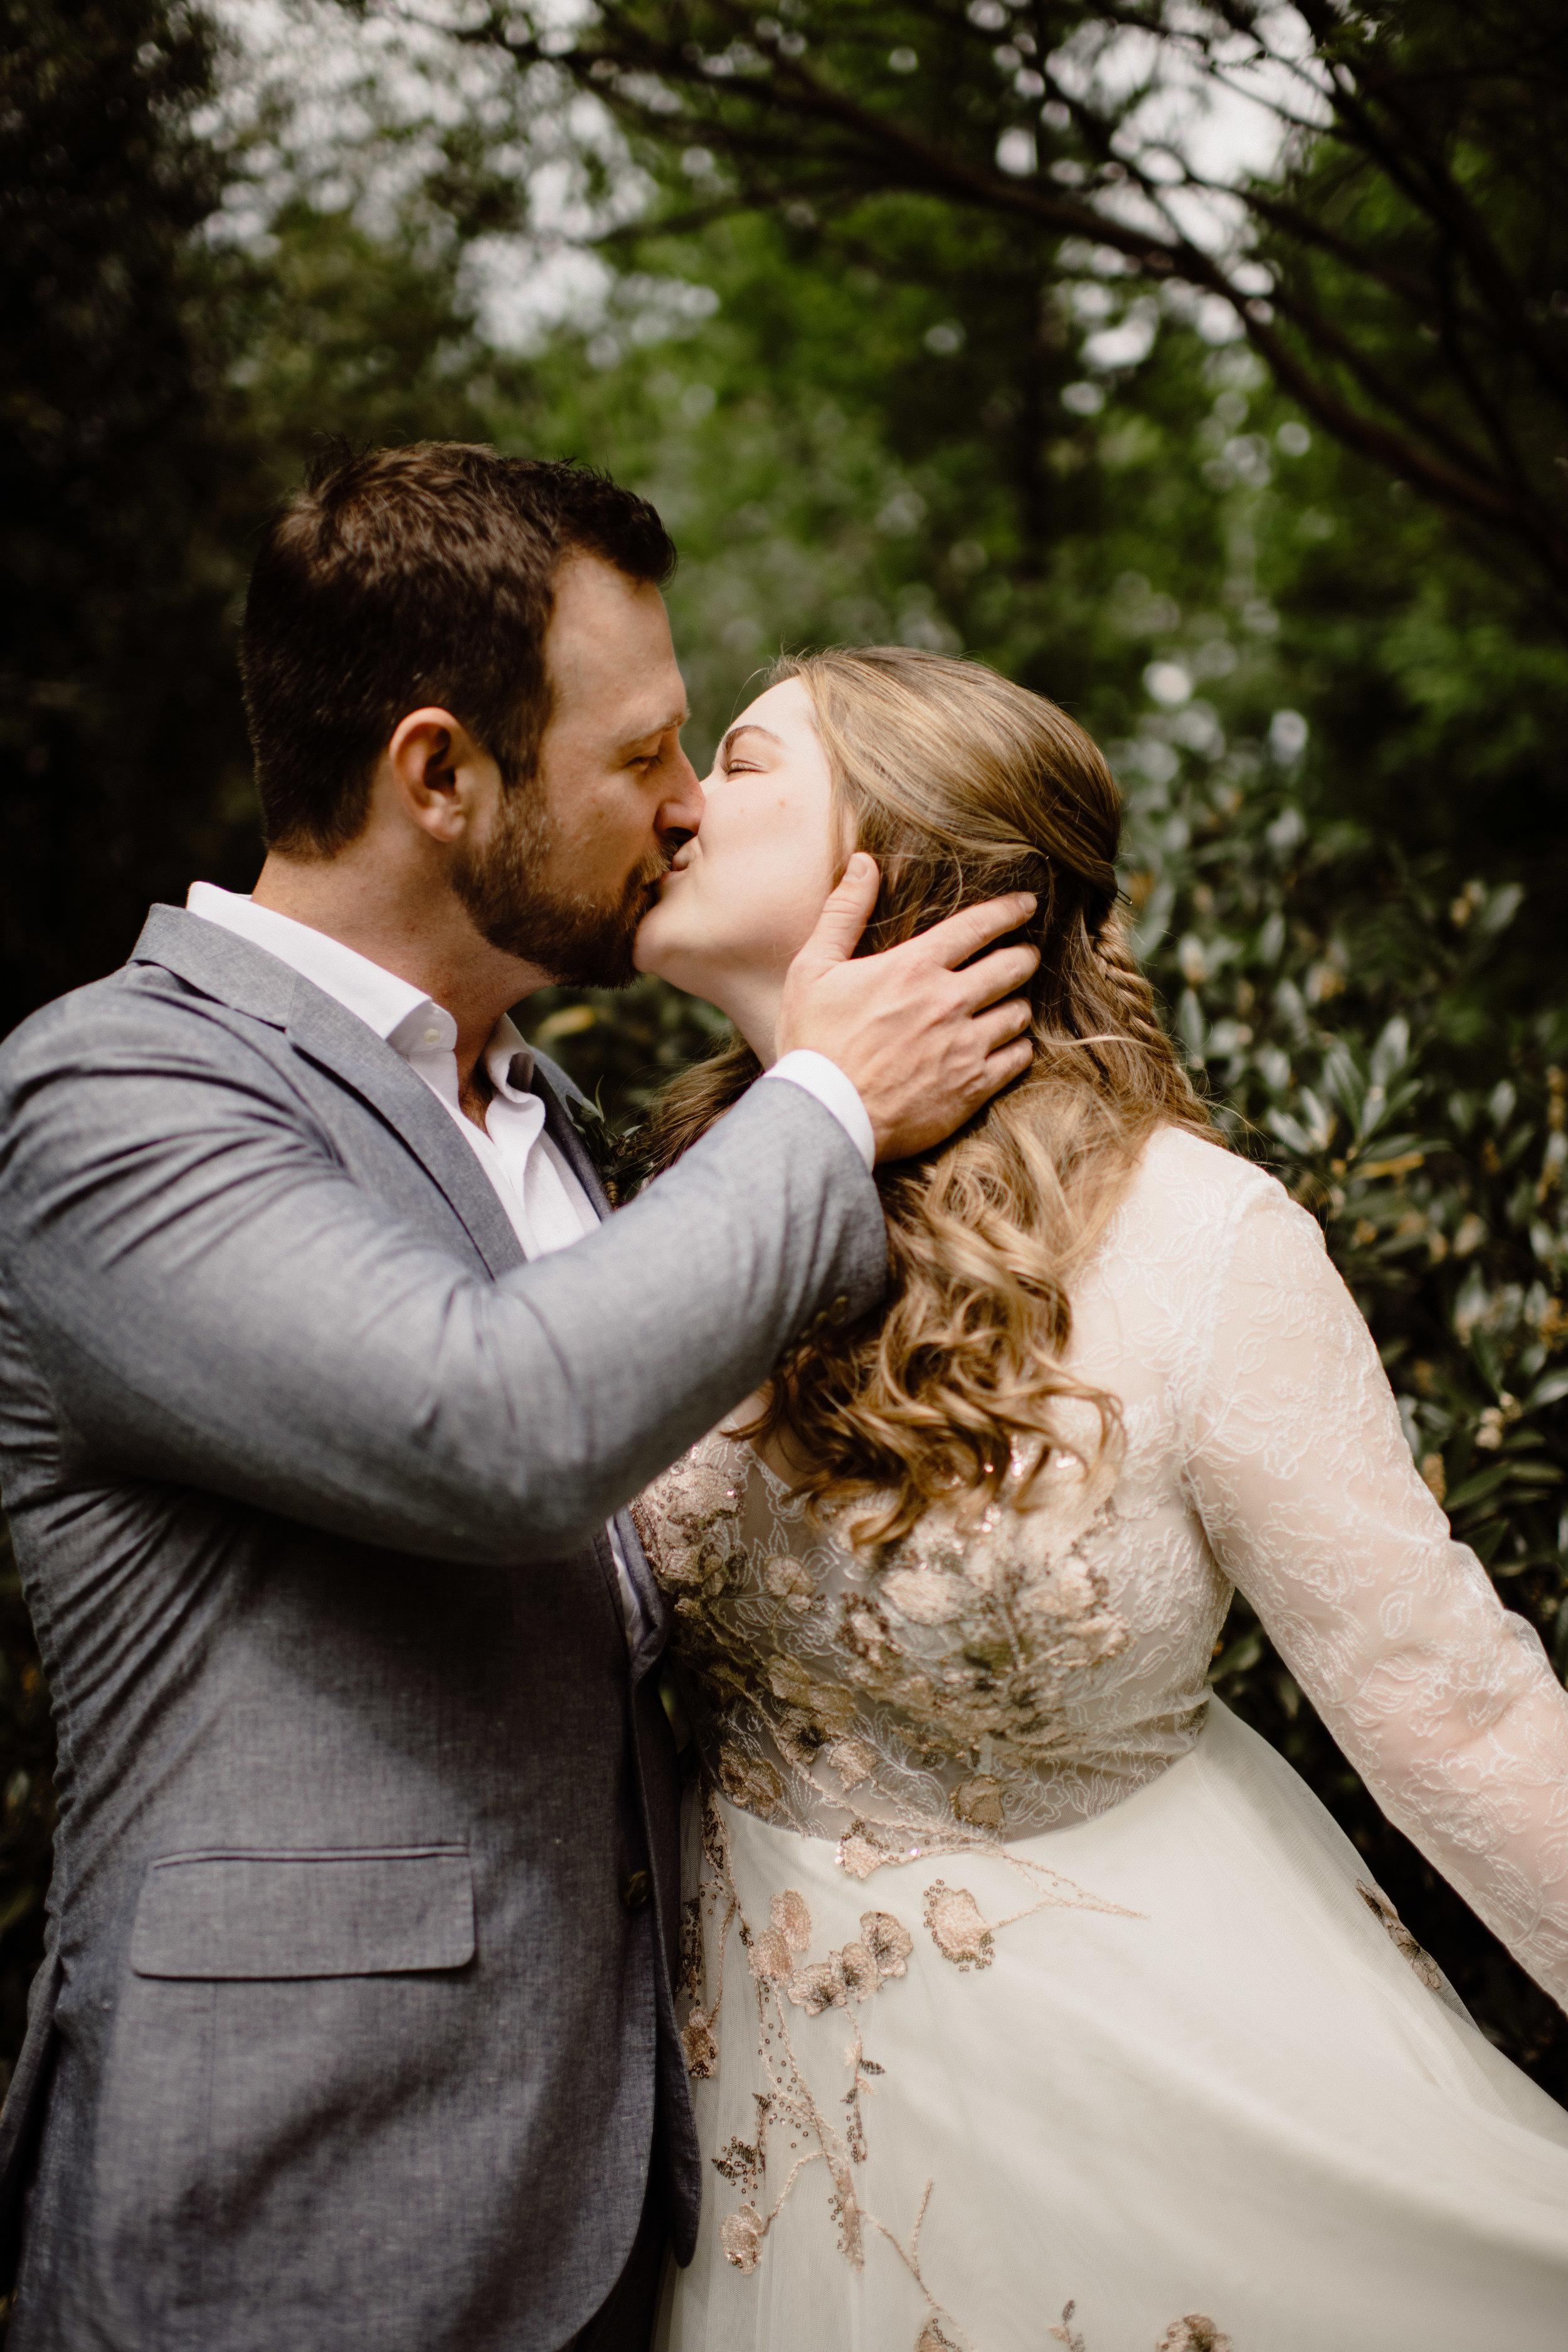 Elizabeth and Aldens Intimate Backyard wedding in Nashville Tennessee Wedding Photographer00004.jpg